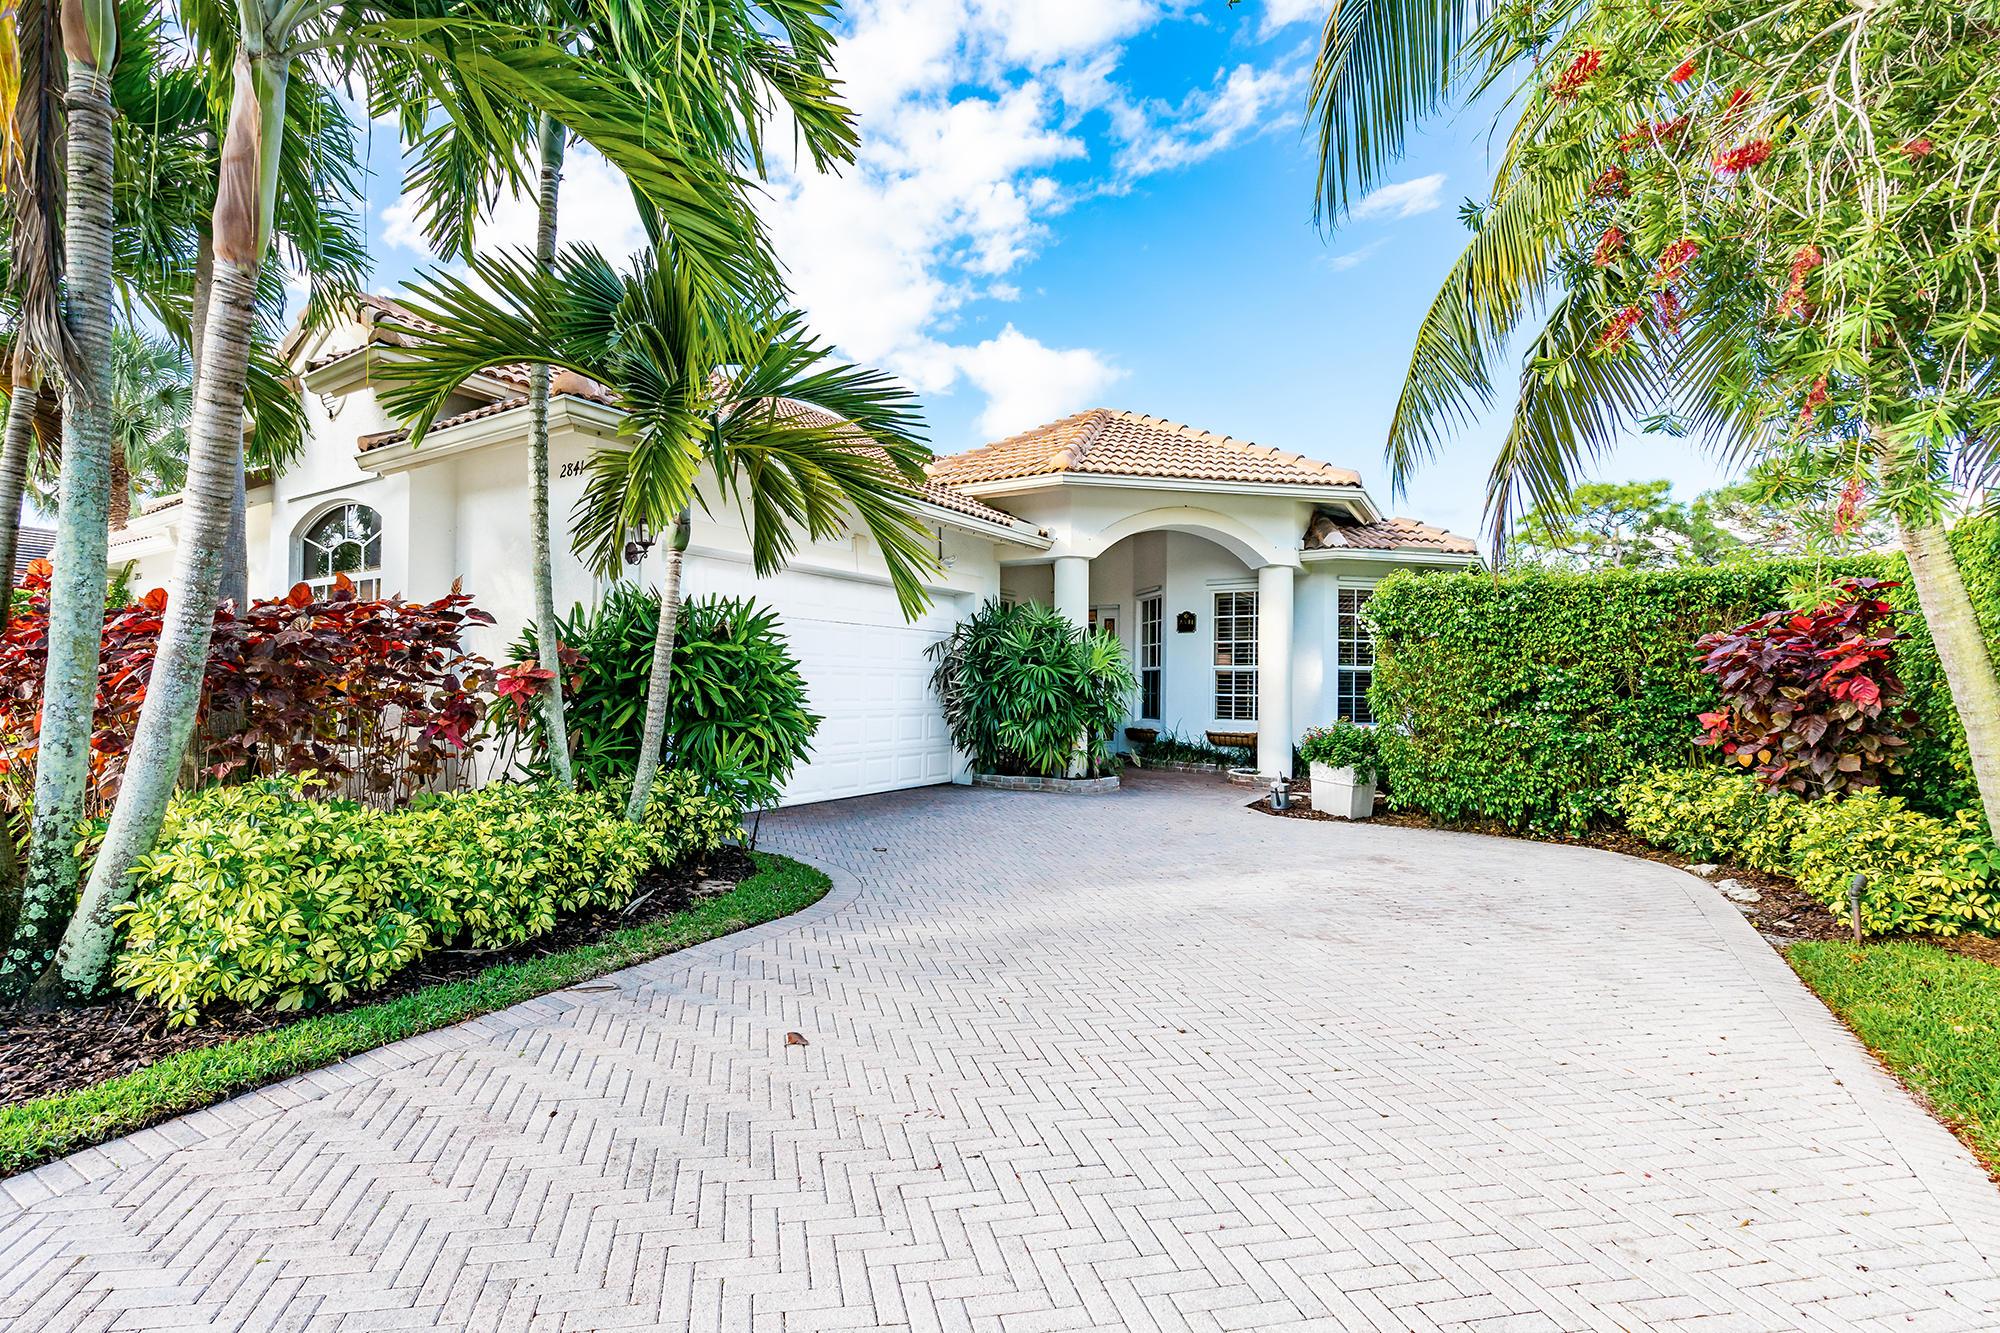 2841 Twin Oaks Way, Wellington, Florida 33414, 3 Bedrooms Bedrooms, ,3 BathroomsBathrooms,Villa,For Sale,Twin Oaks,RX-10521799